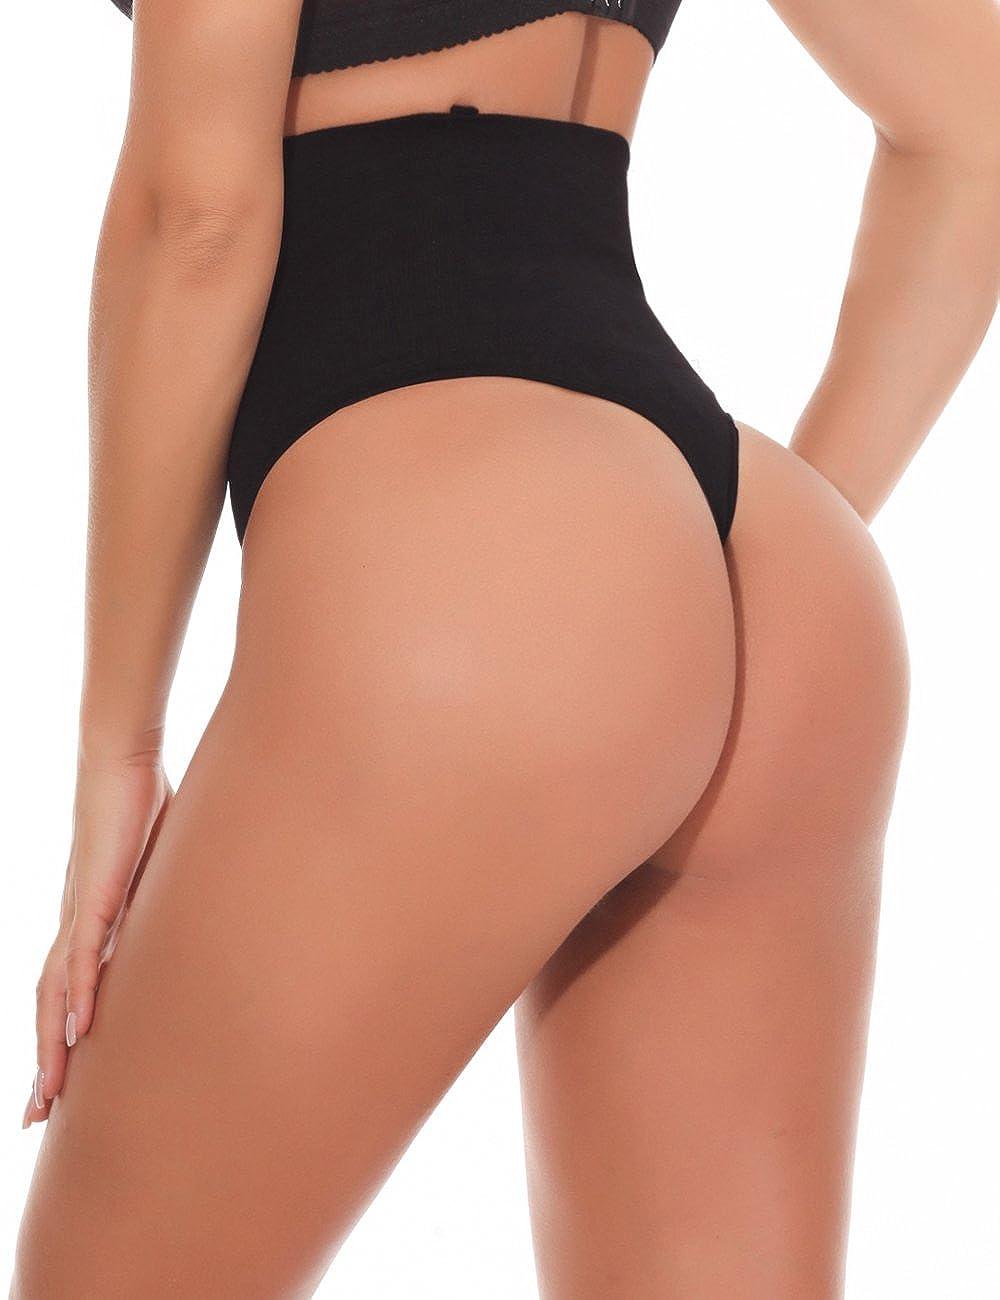 61f6964c462 NINGMI Women Waist Cincher High Waist Tummy Control Knickers Slimming Thong Panties  Underwear NMNB602